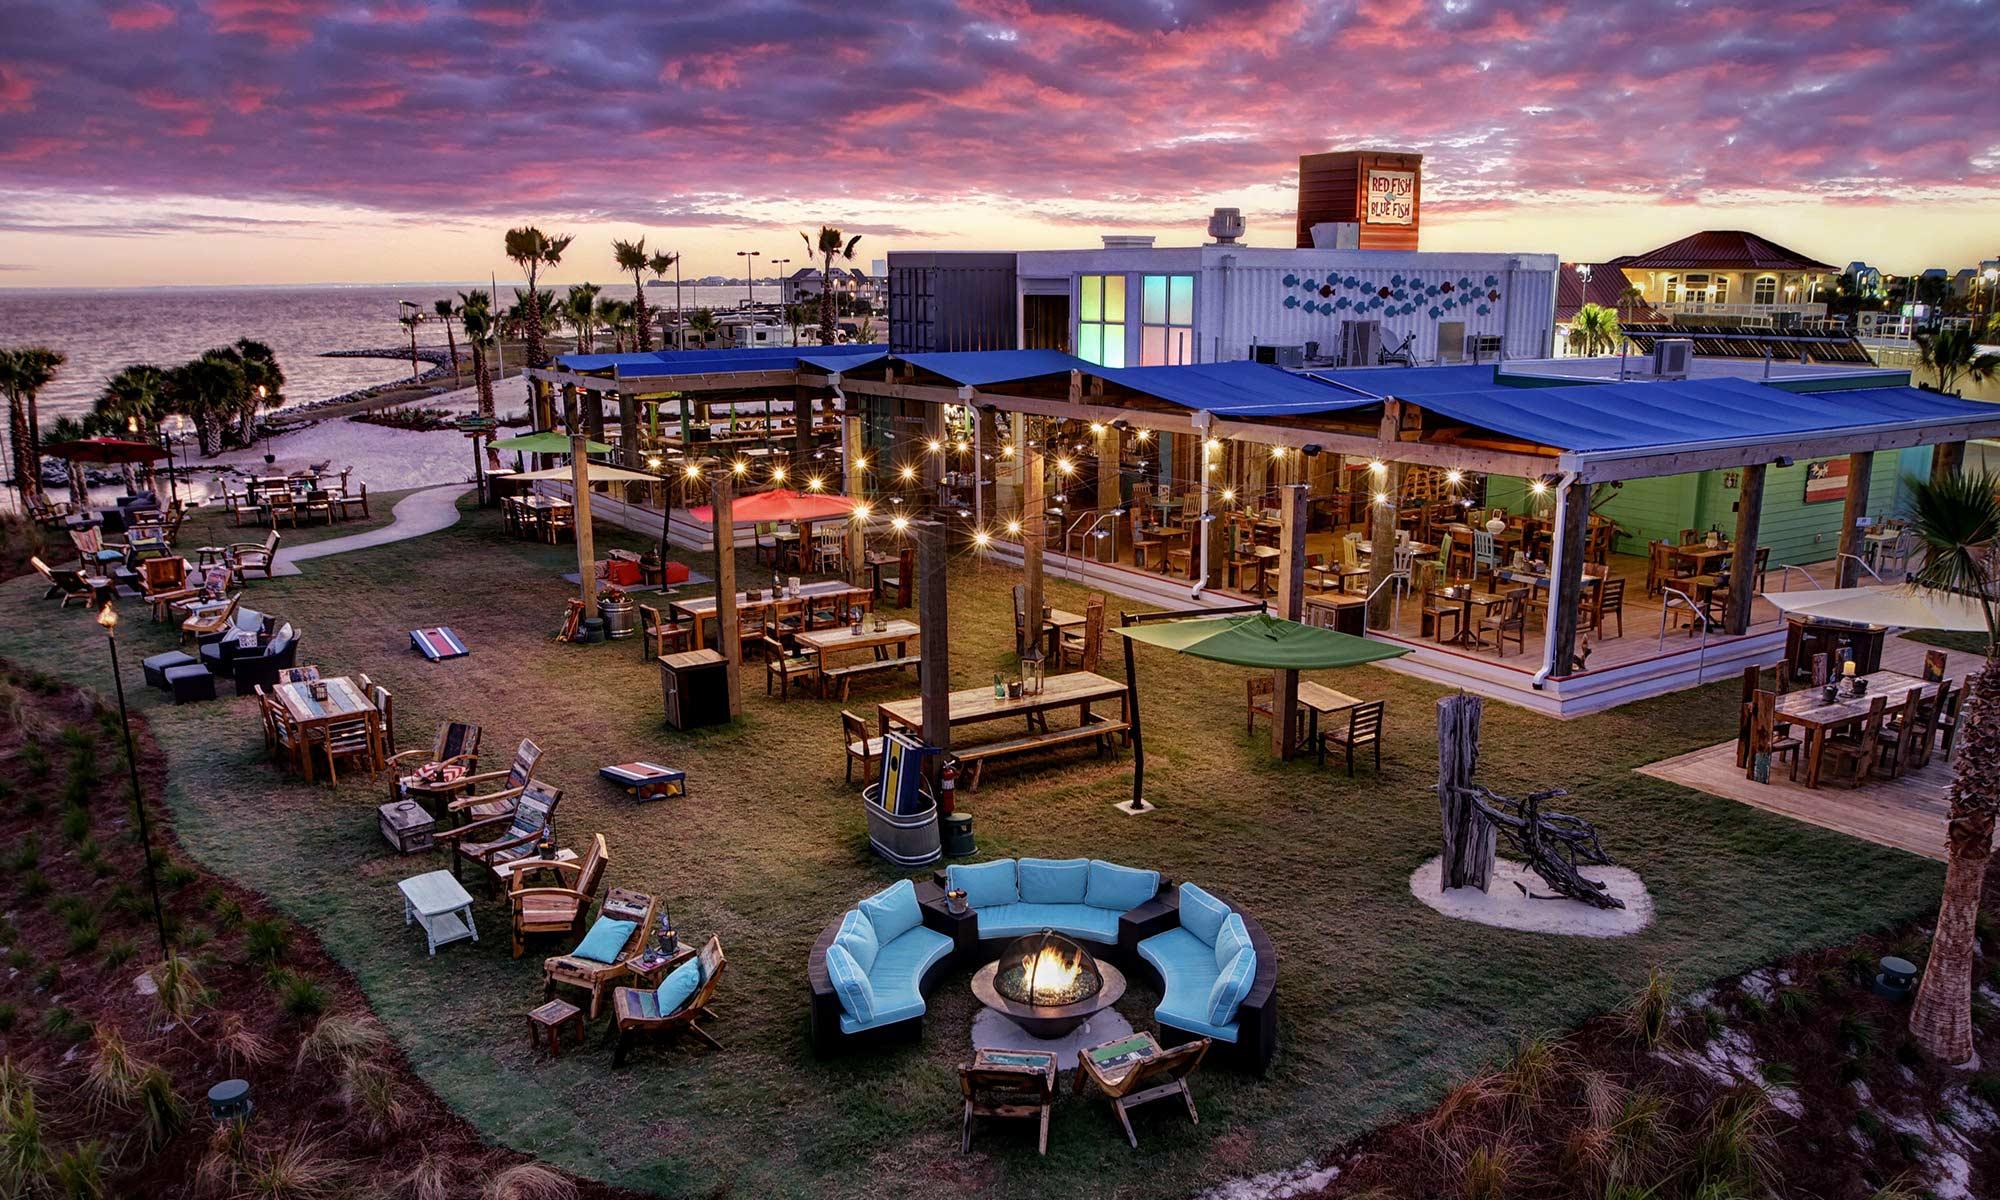 Red Fish Blue Restaurant